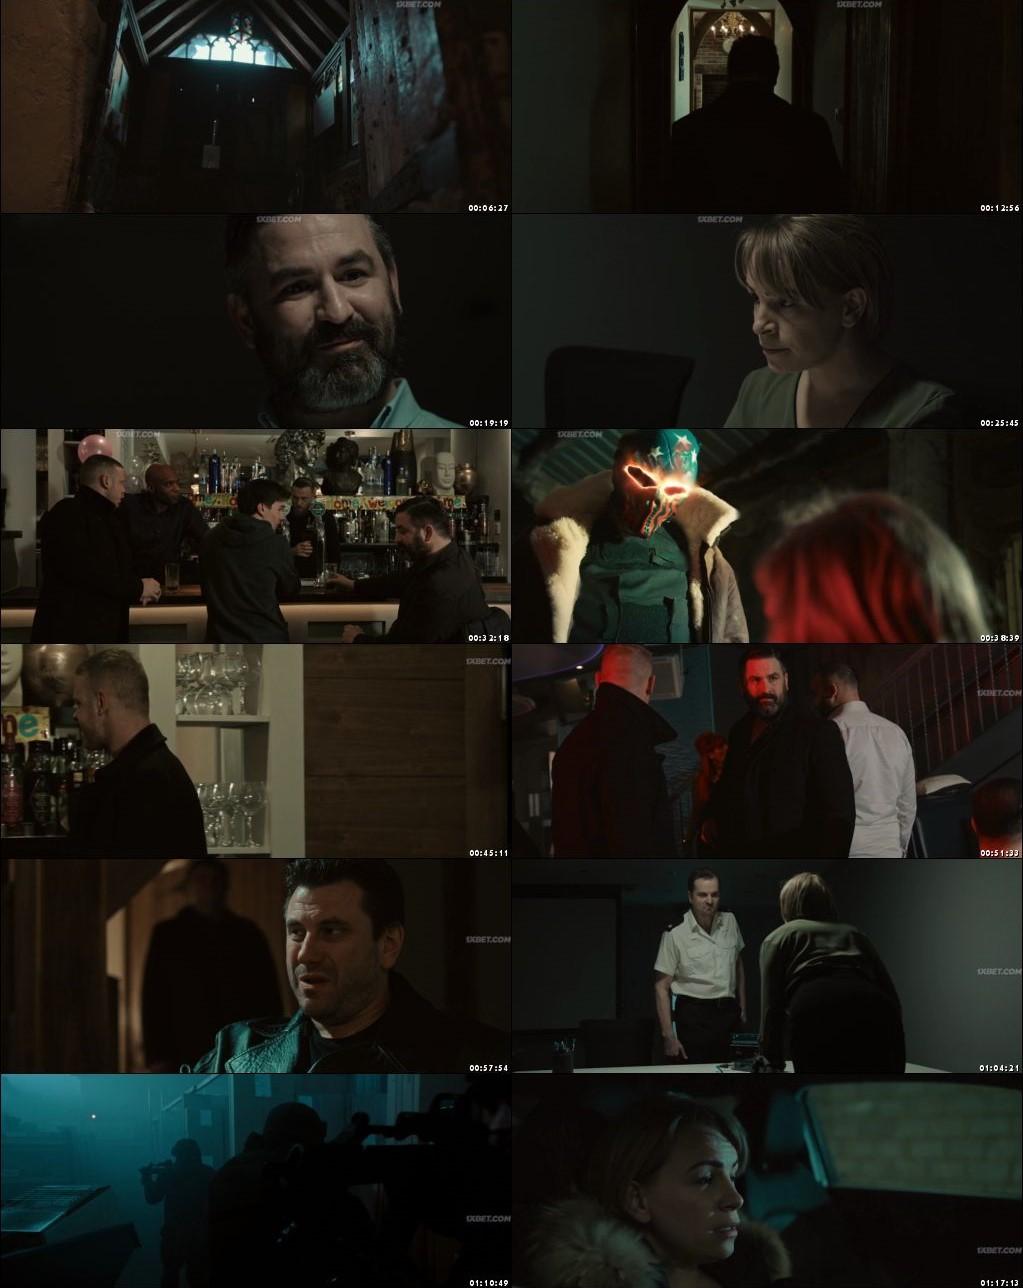 24 Little Hours 2020 Full Movie Online Watch